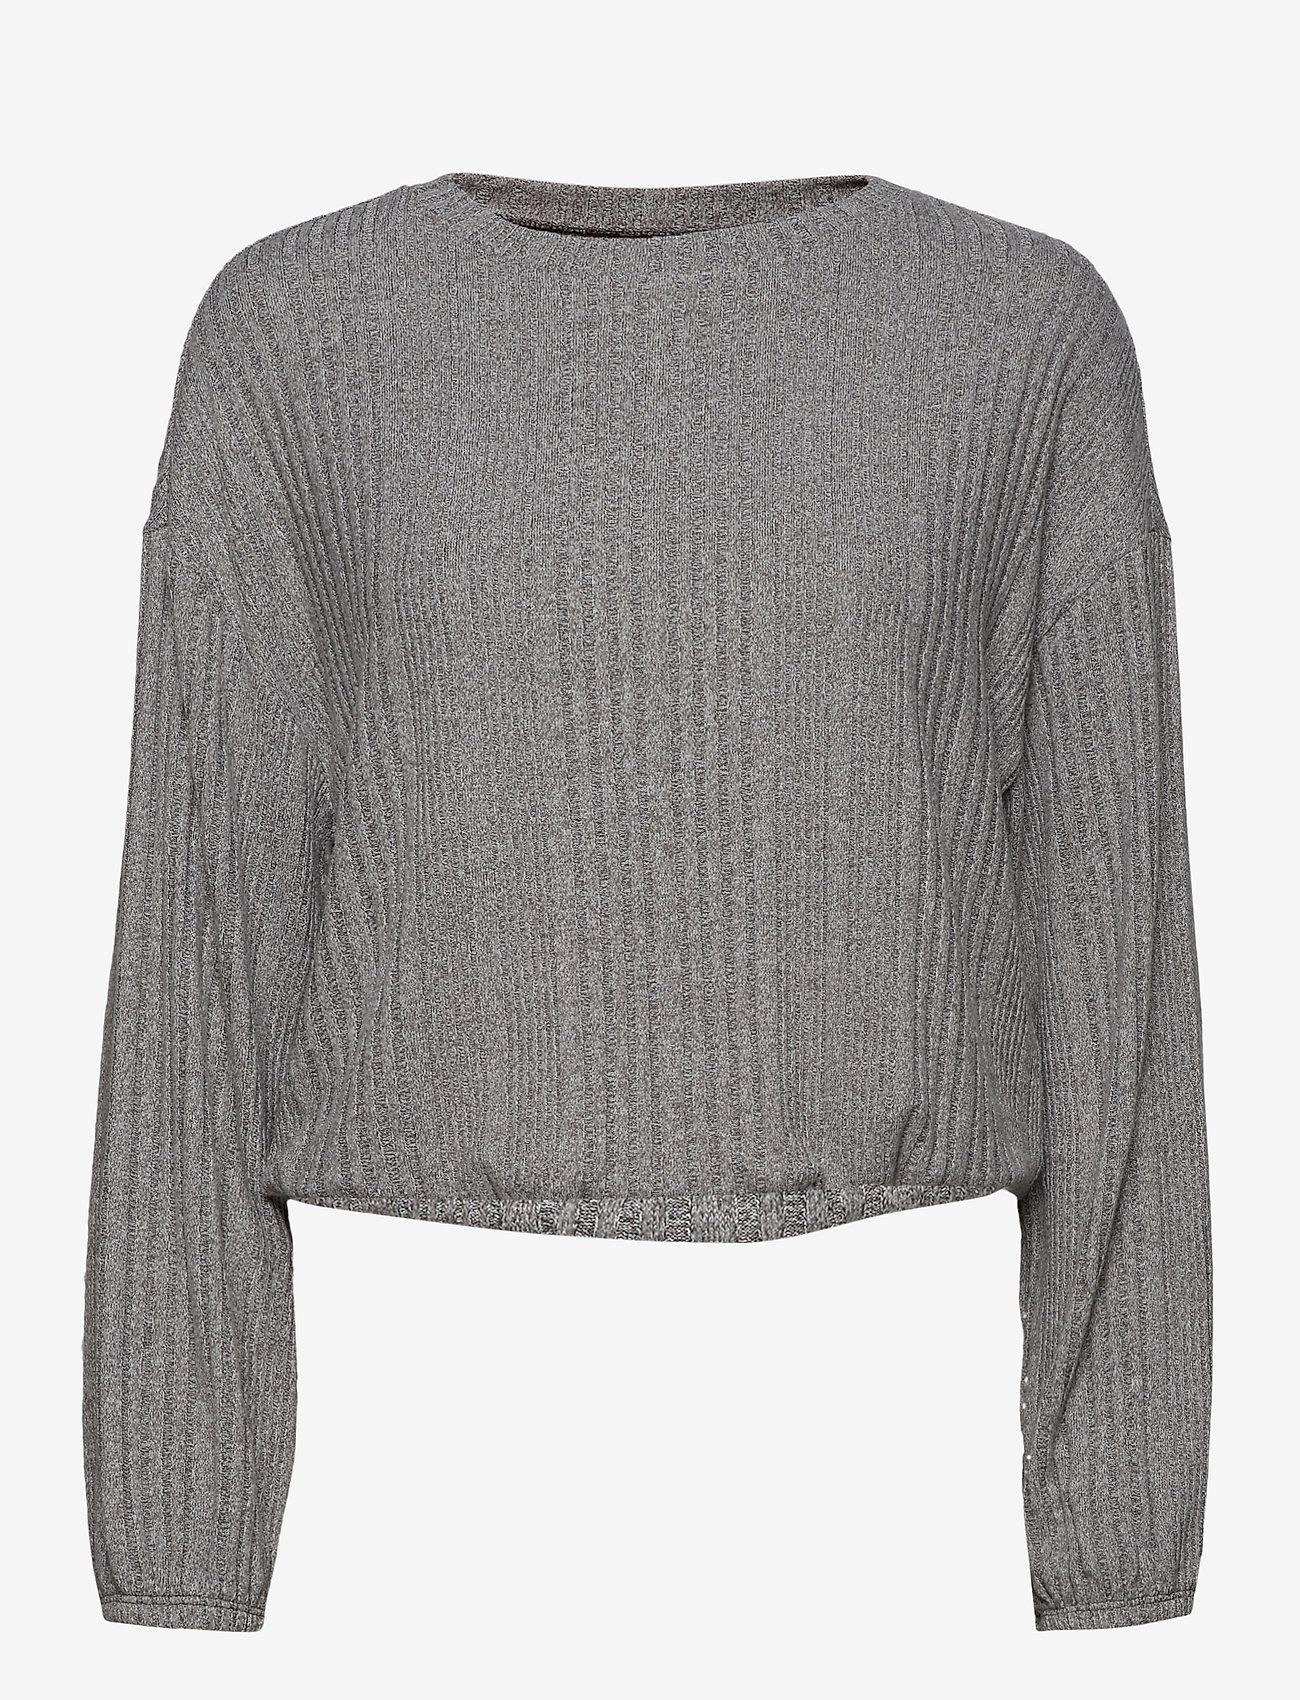 Gilly Hicks - VAR RIB COZY LS - overdele - dark heather grey - 0